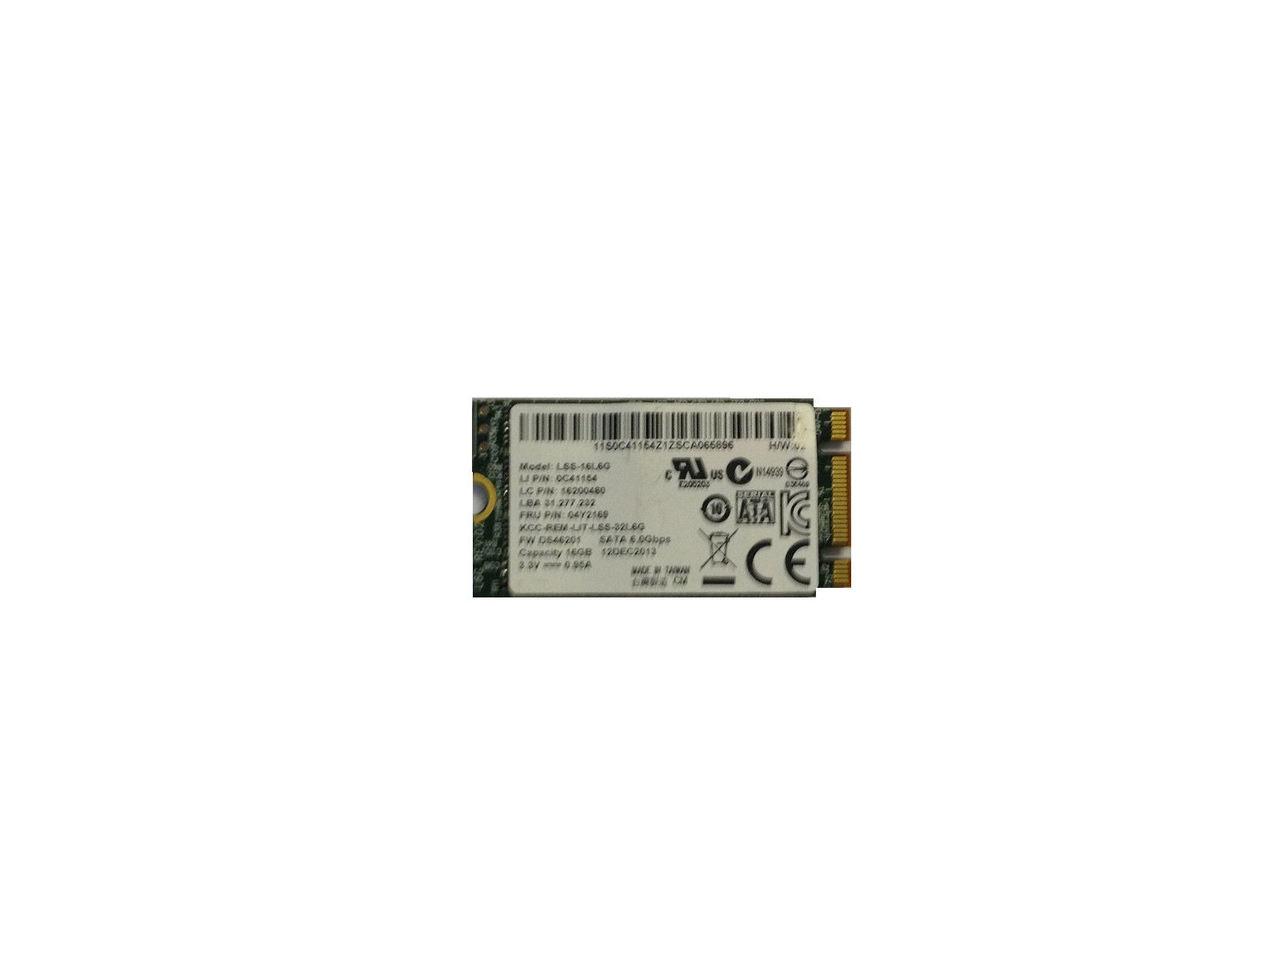 Lenovo U530 Touch LiteOn 16GB SSD mSATA Solid State Hard